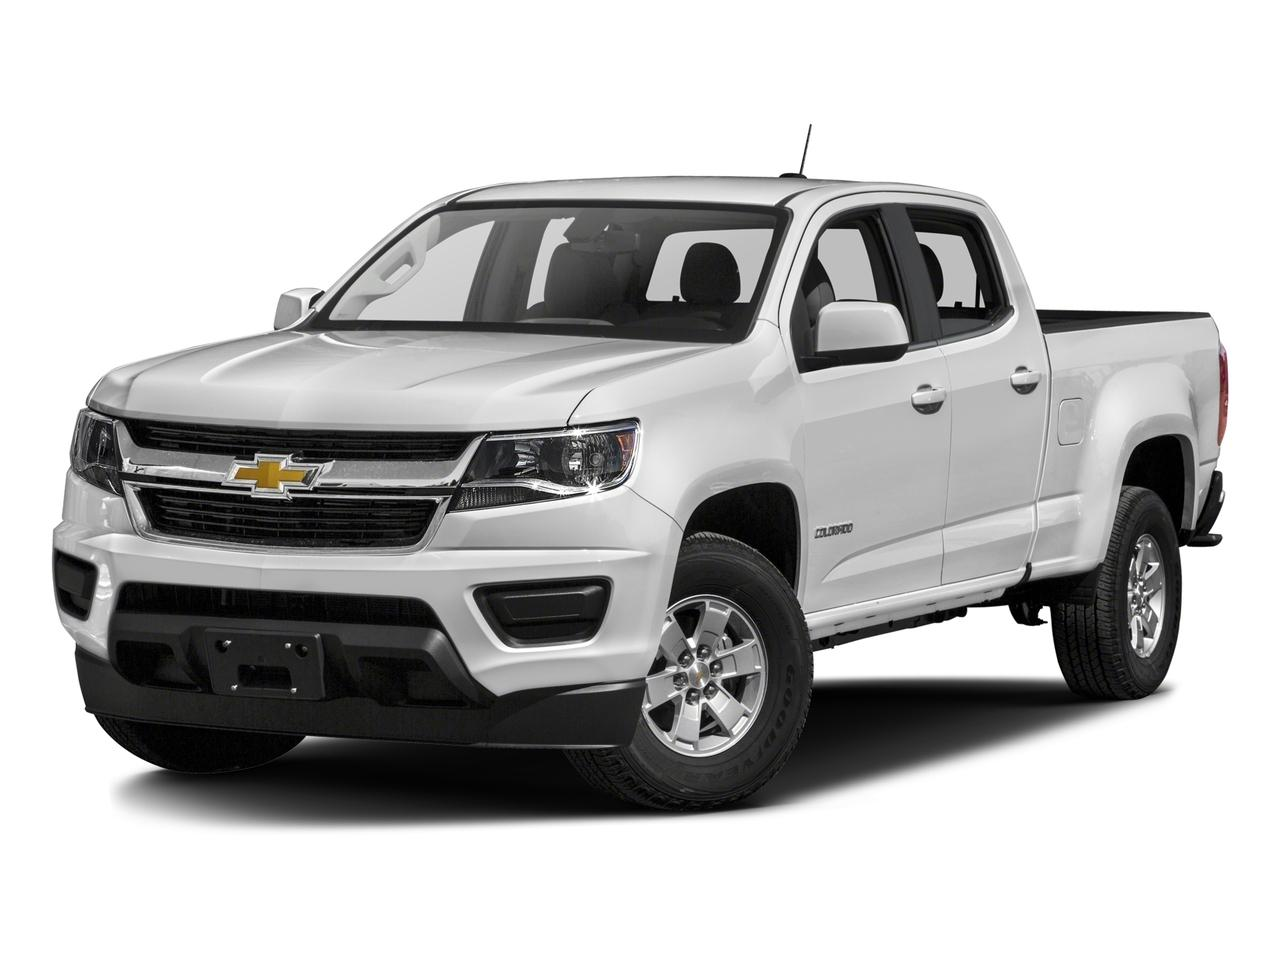 2018 Chevrolet Colorado Vehicle Photo in Nashua, NH 03060